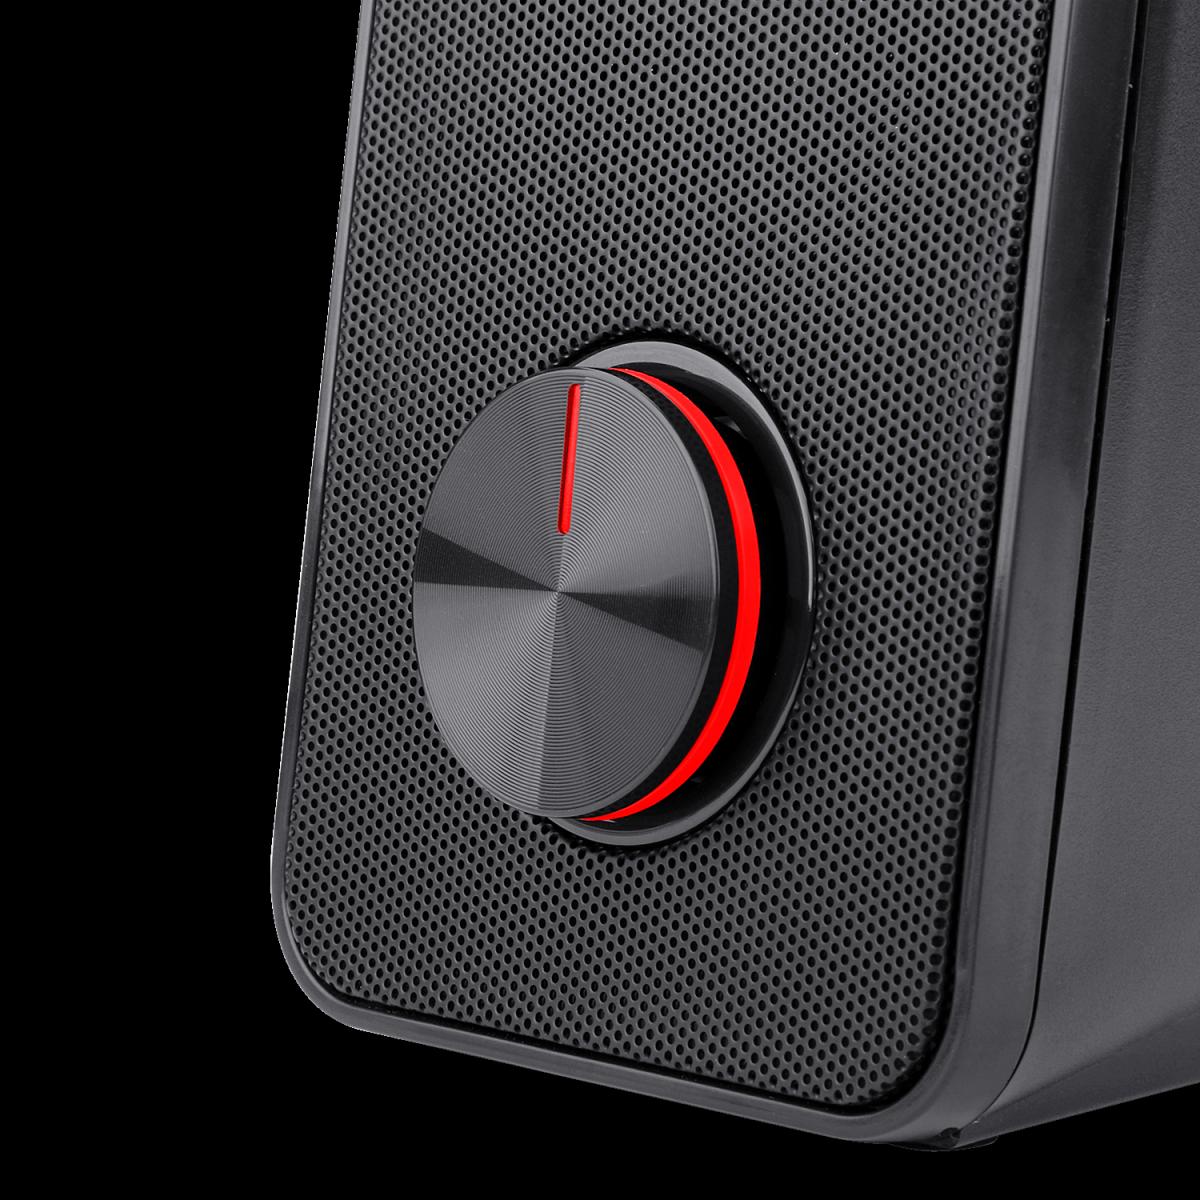 Caixa de Som Gamer Redragon Stentor 2.0, 2x5W, 3.5Mm, Estéreo, Led RED, GS500